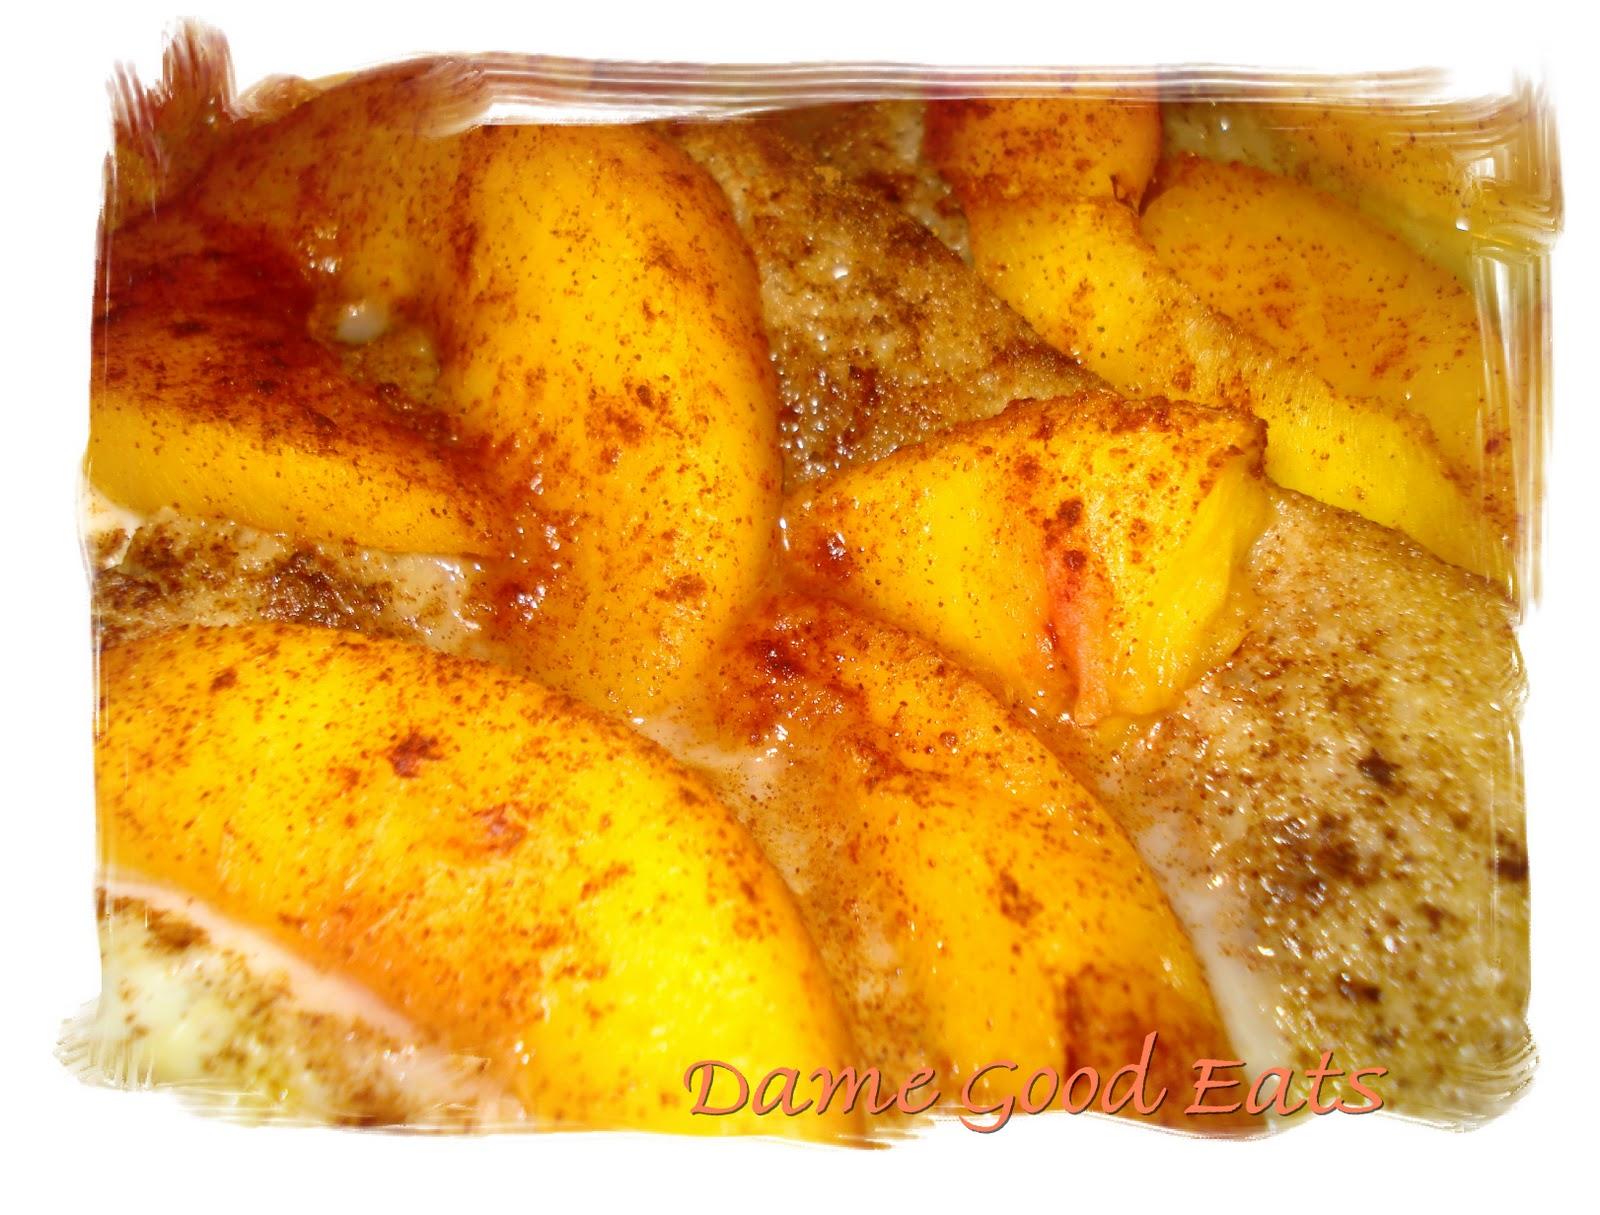 Dame Good Eats: Holiday Breakfast: Peach French Toast Bake